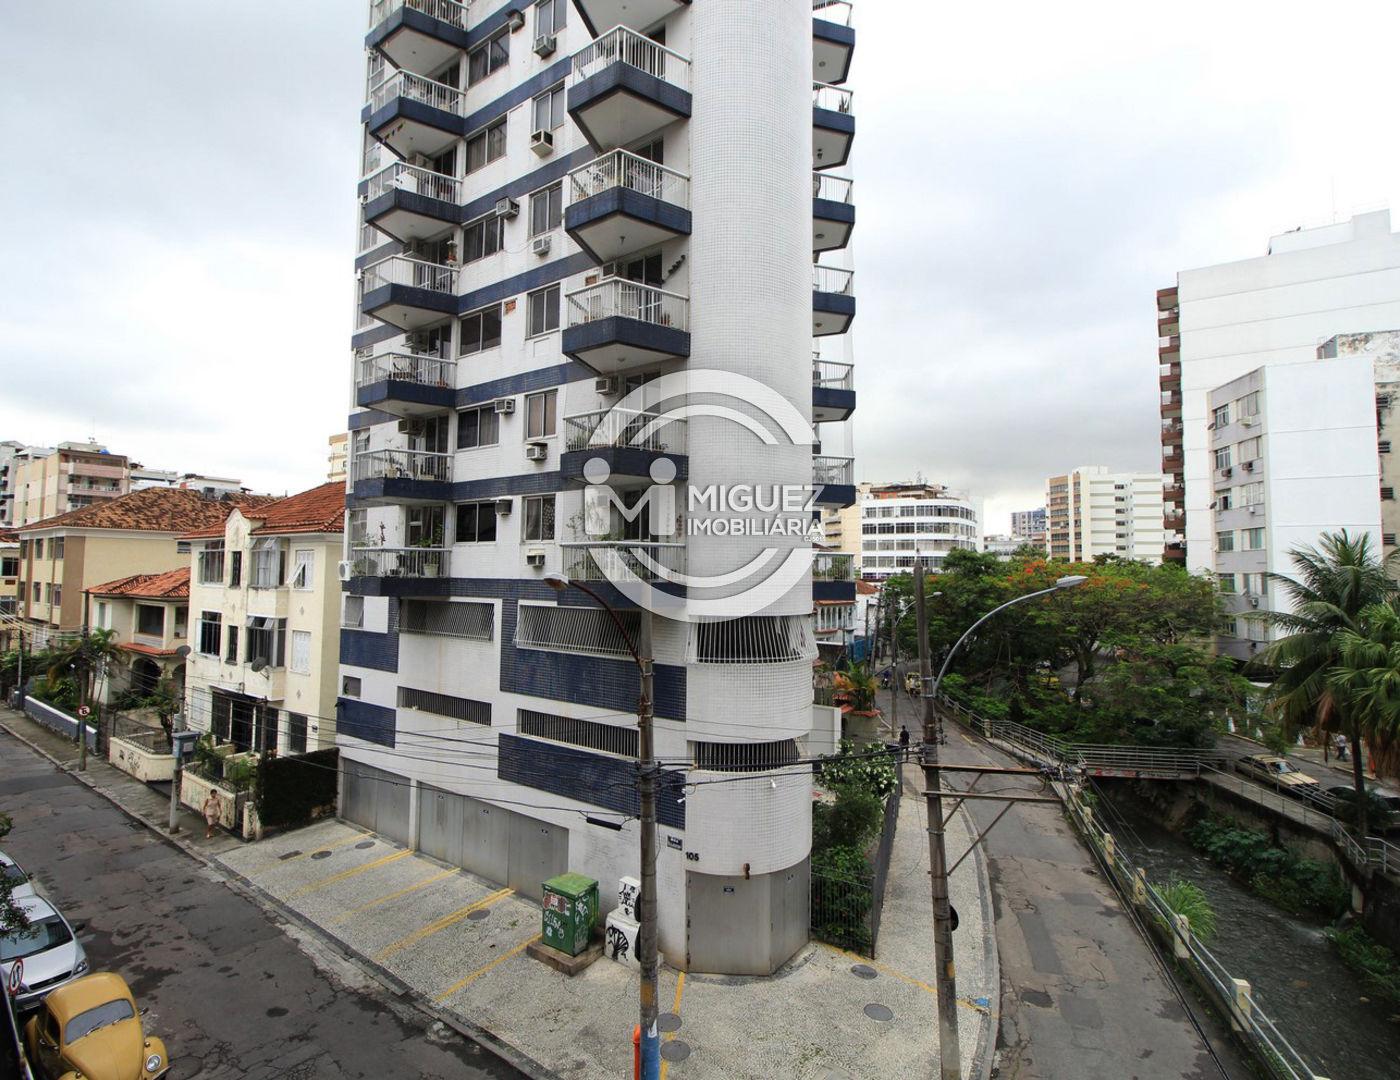 Apartamento, aluguel, Avenida Maracanã - Tijuca , Rio de janeiro